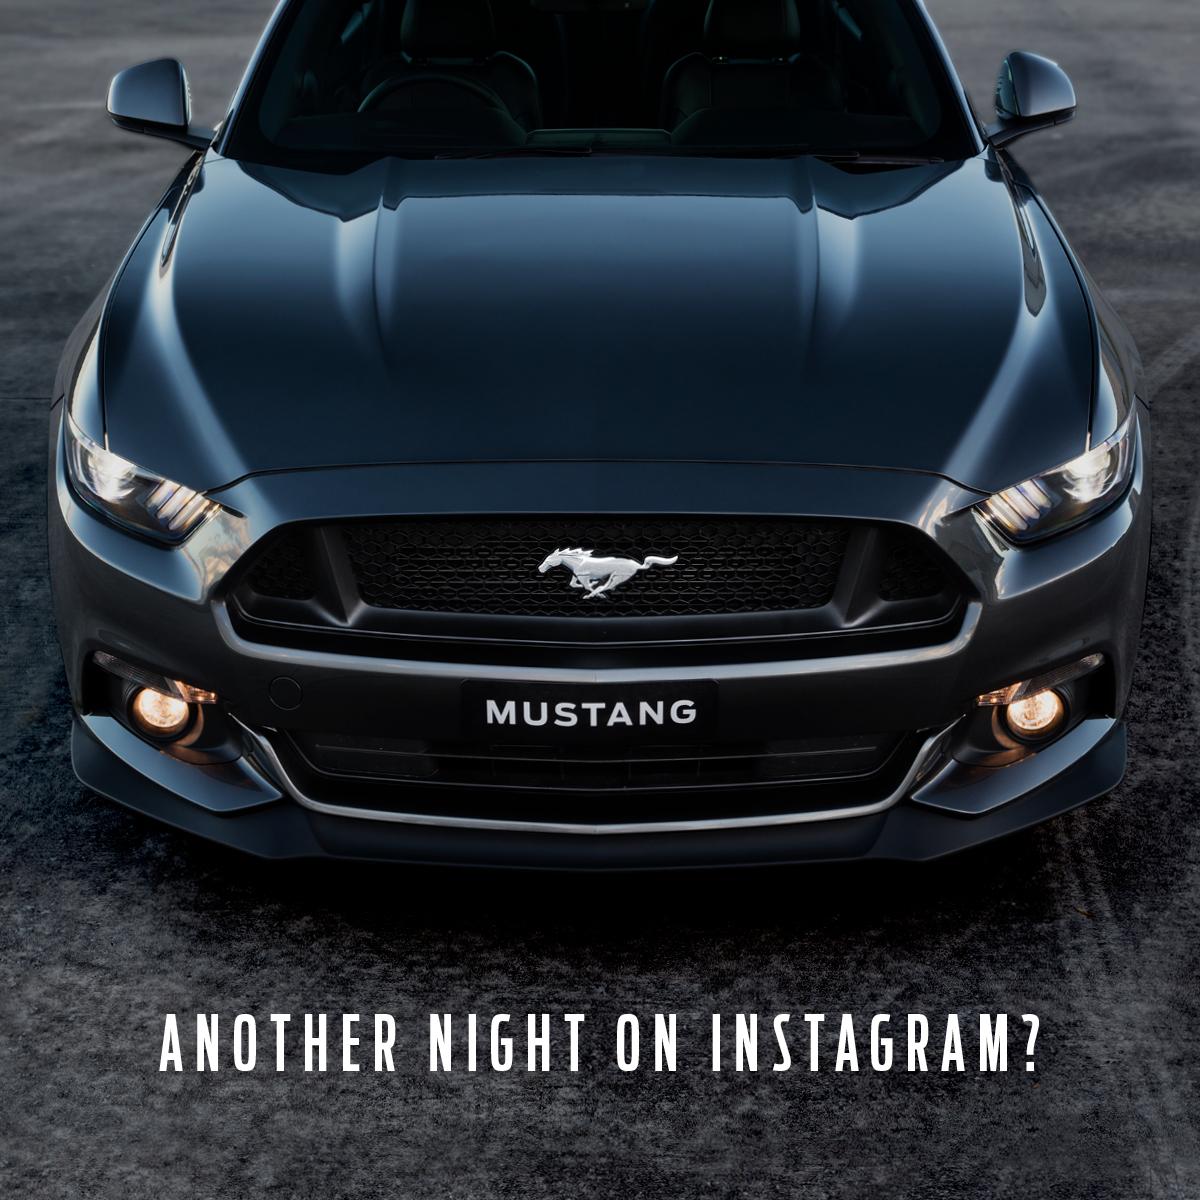 Mustang Social